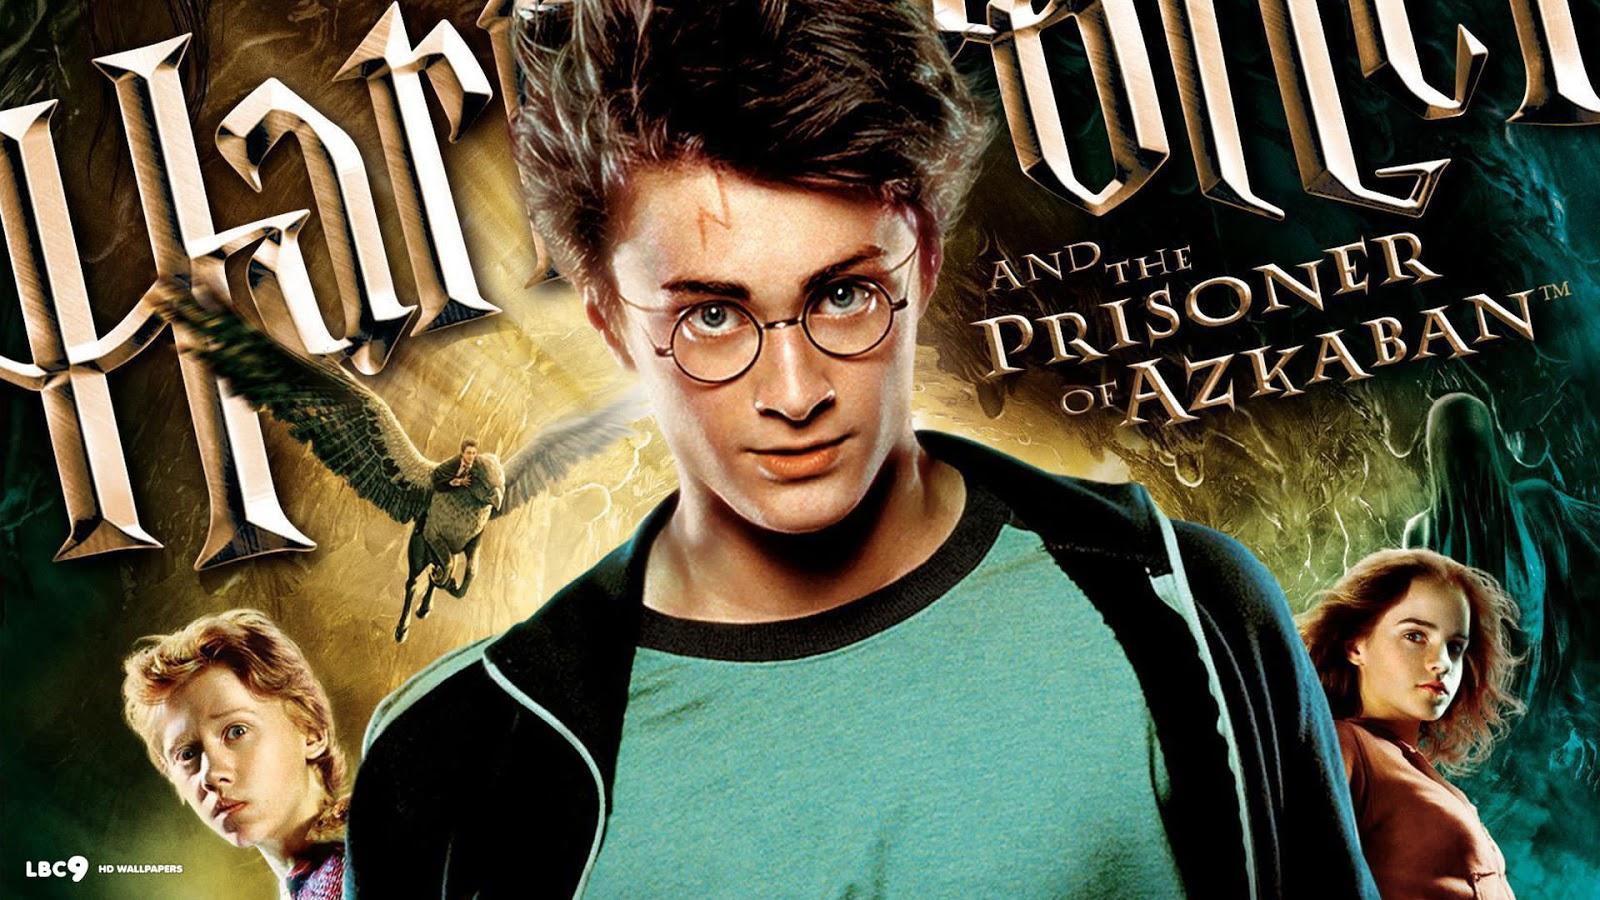 Harry Potter And The Prisoner Of Azkaban 2004 Ton2 Aja